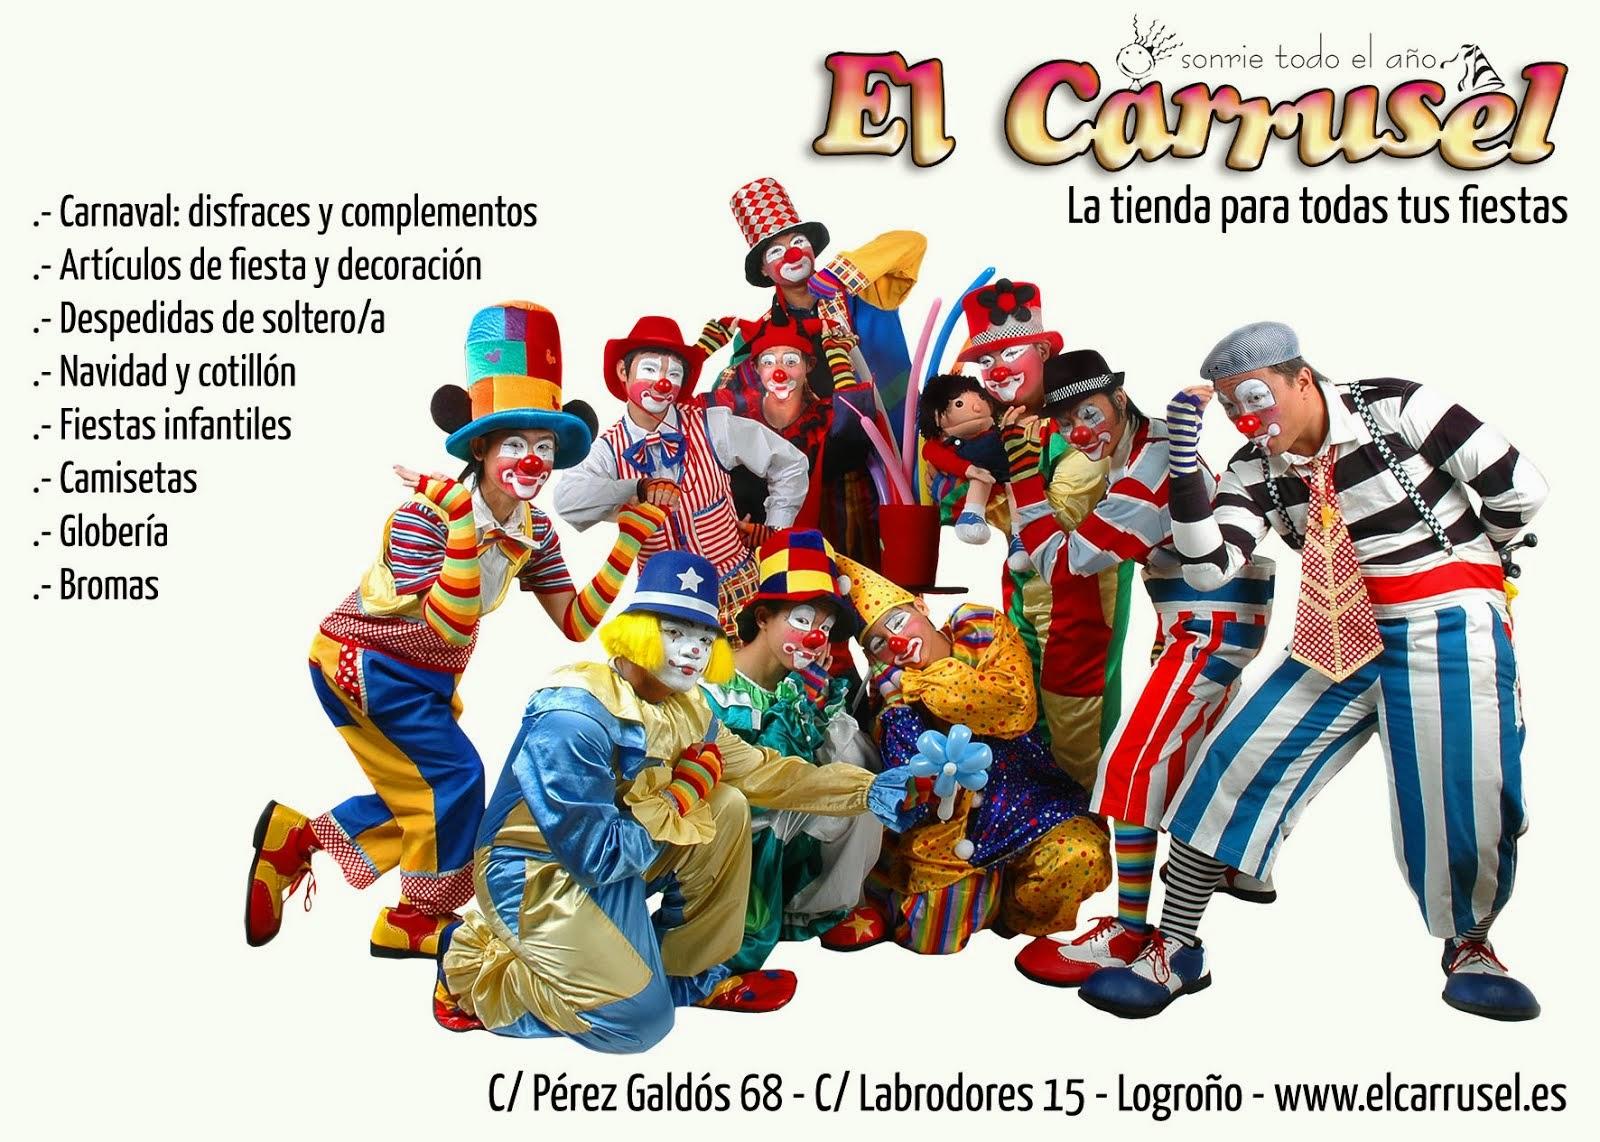 El Carrusel